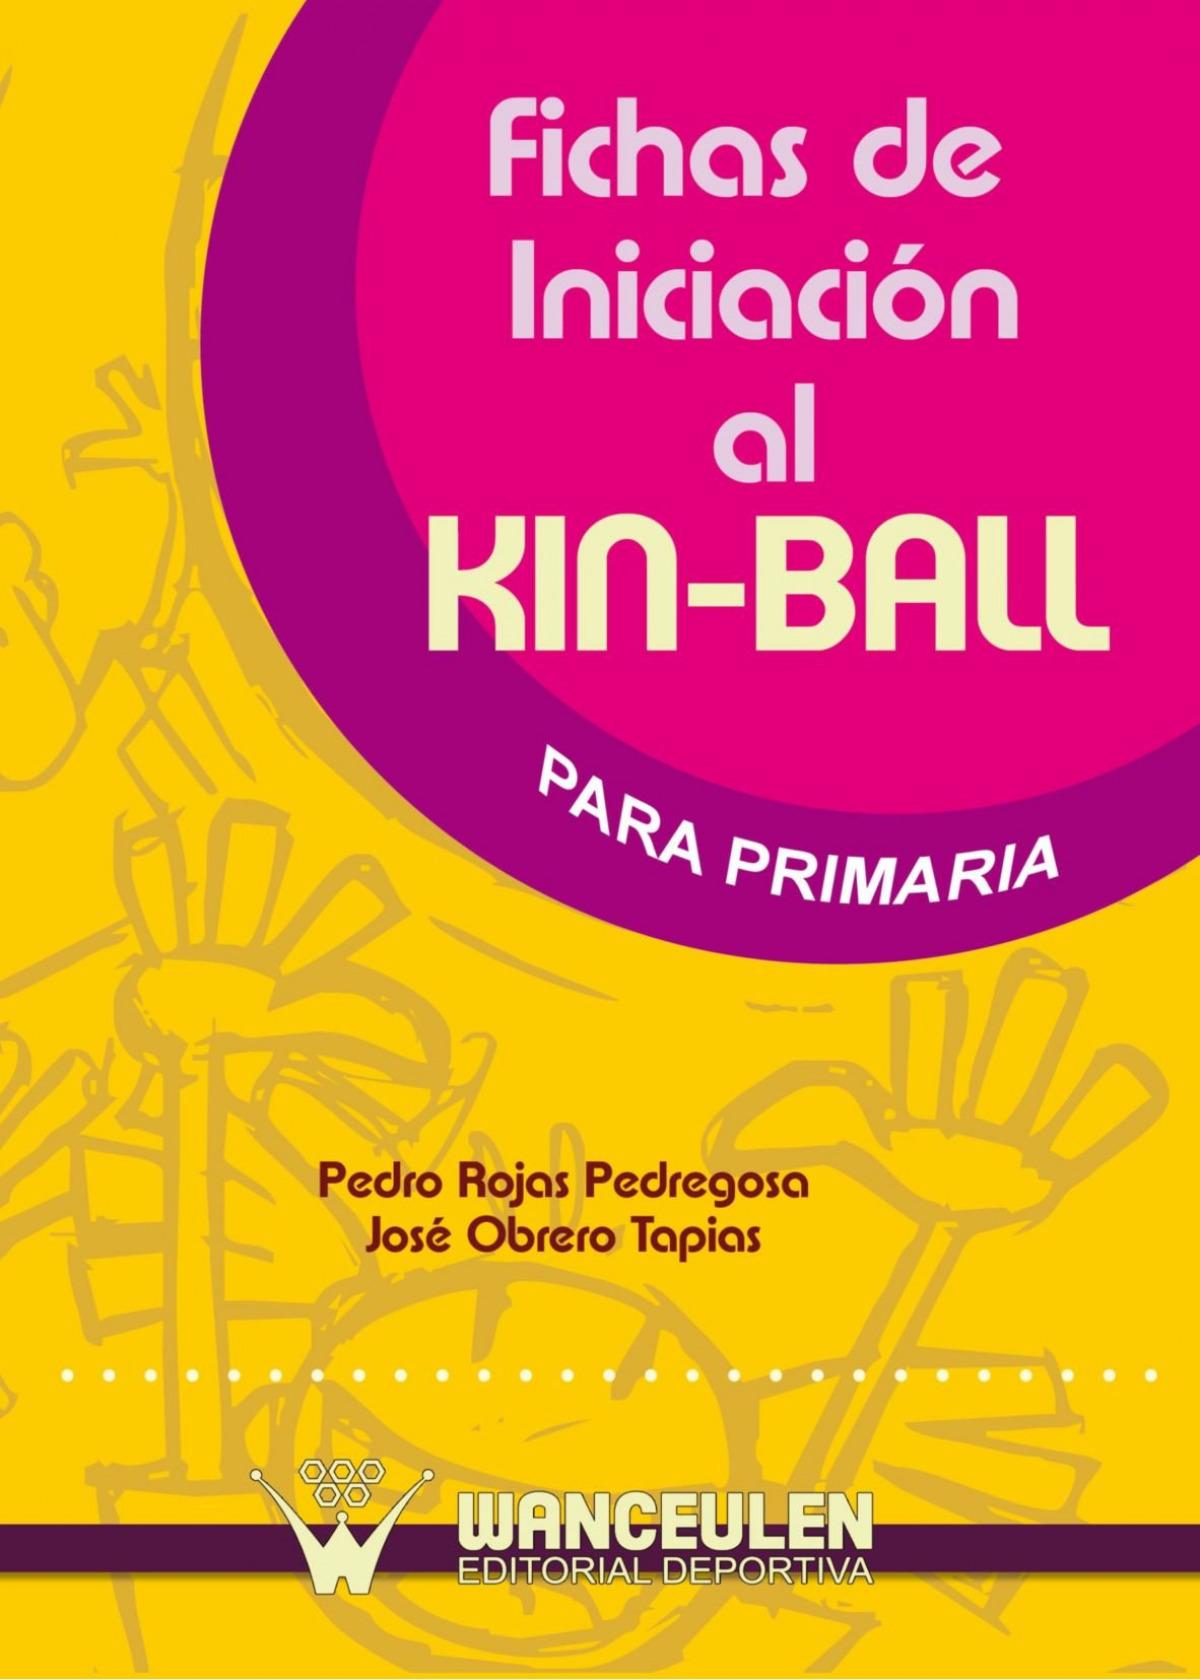 Fichas iniciacion kin-ball primaria - Rojas, Pedro